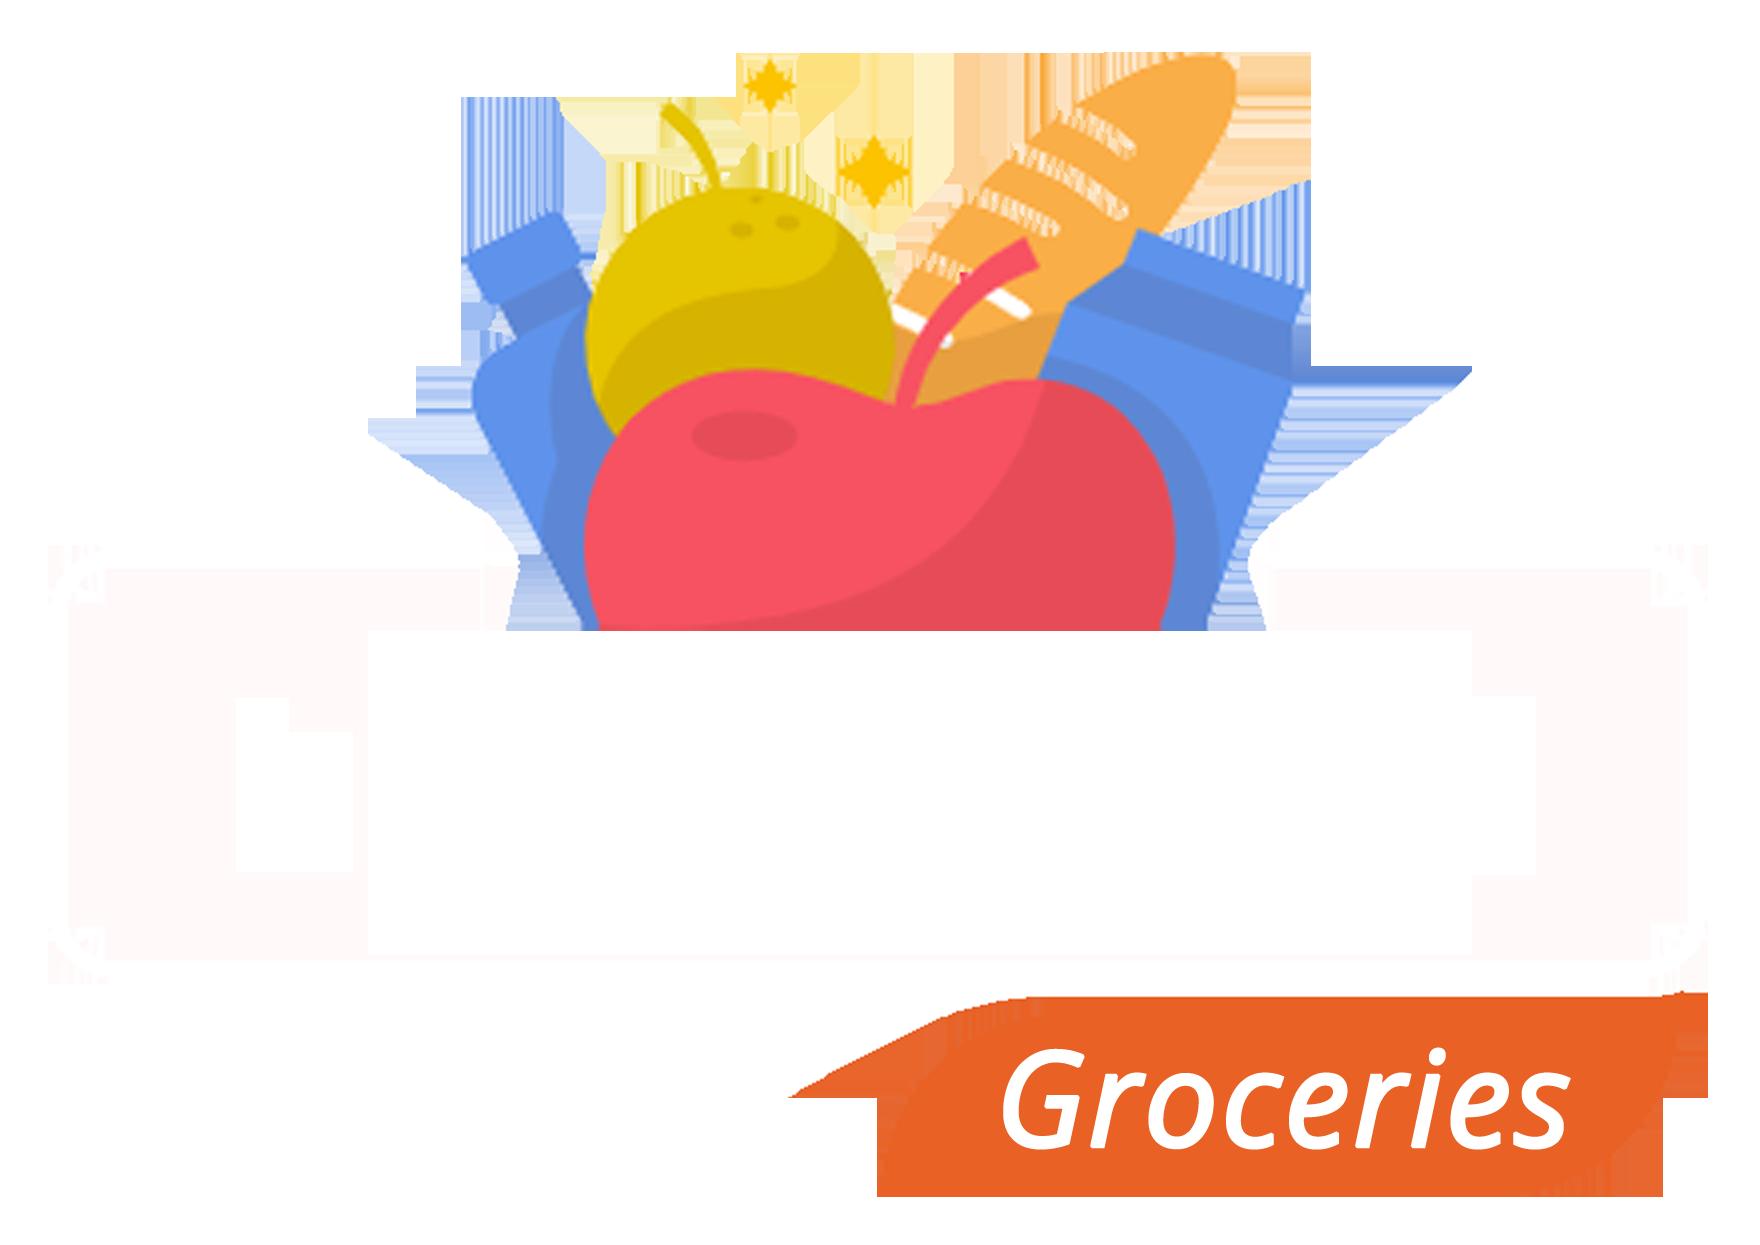 LiveKarts Groceries